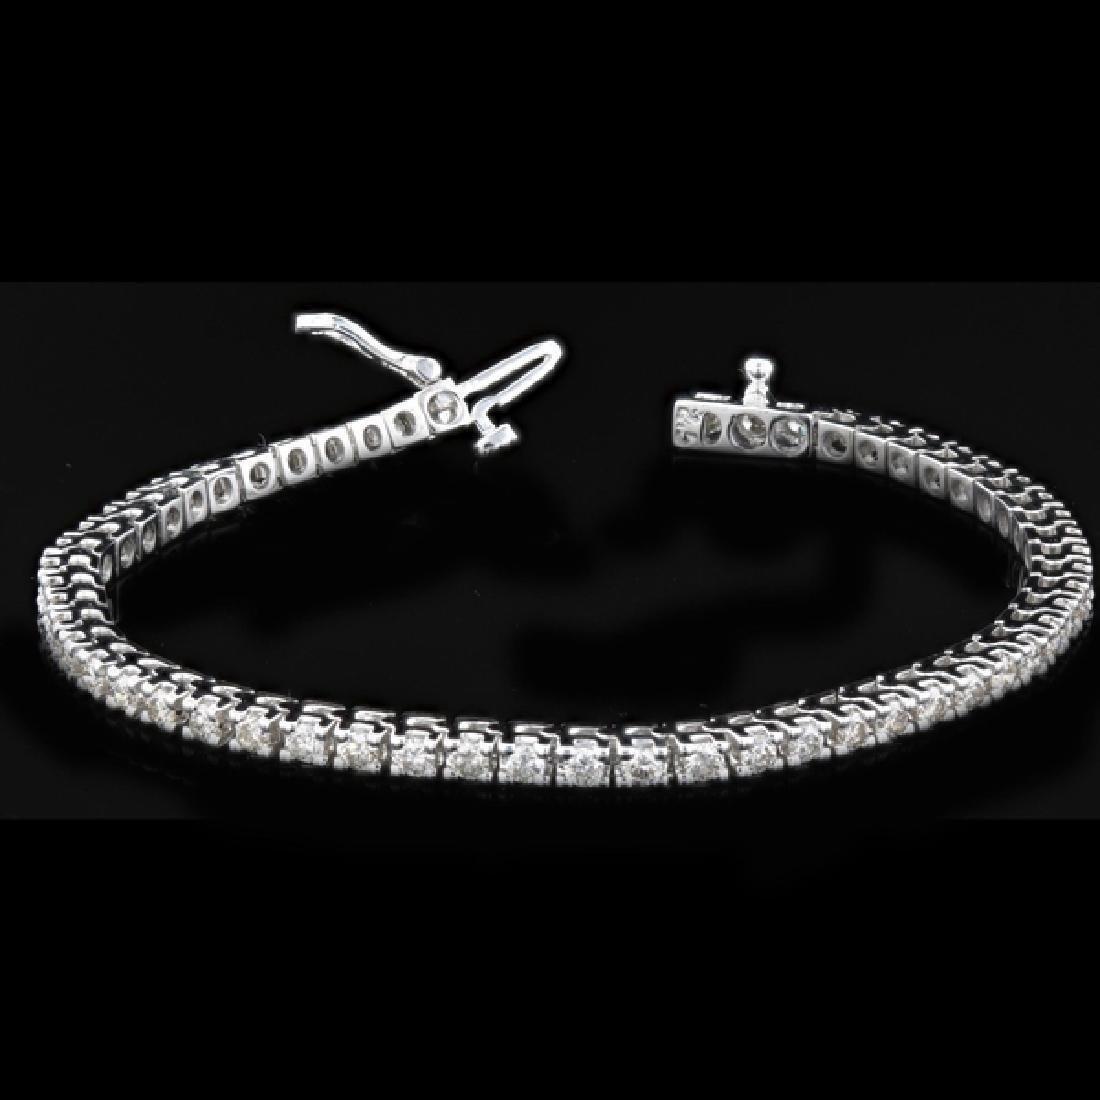 14k White Gold 3.57ctw Diamond Tennis Bracelet